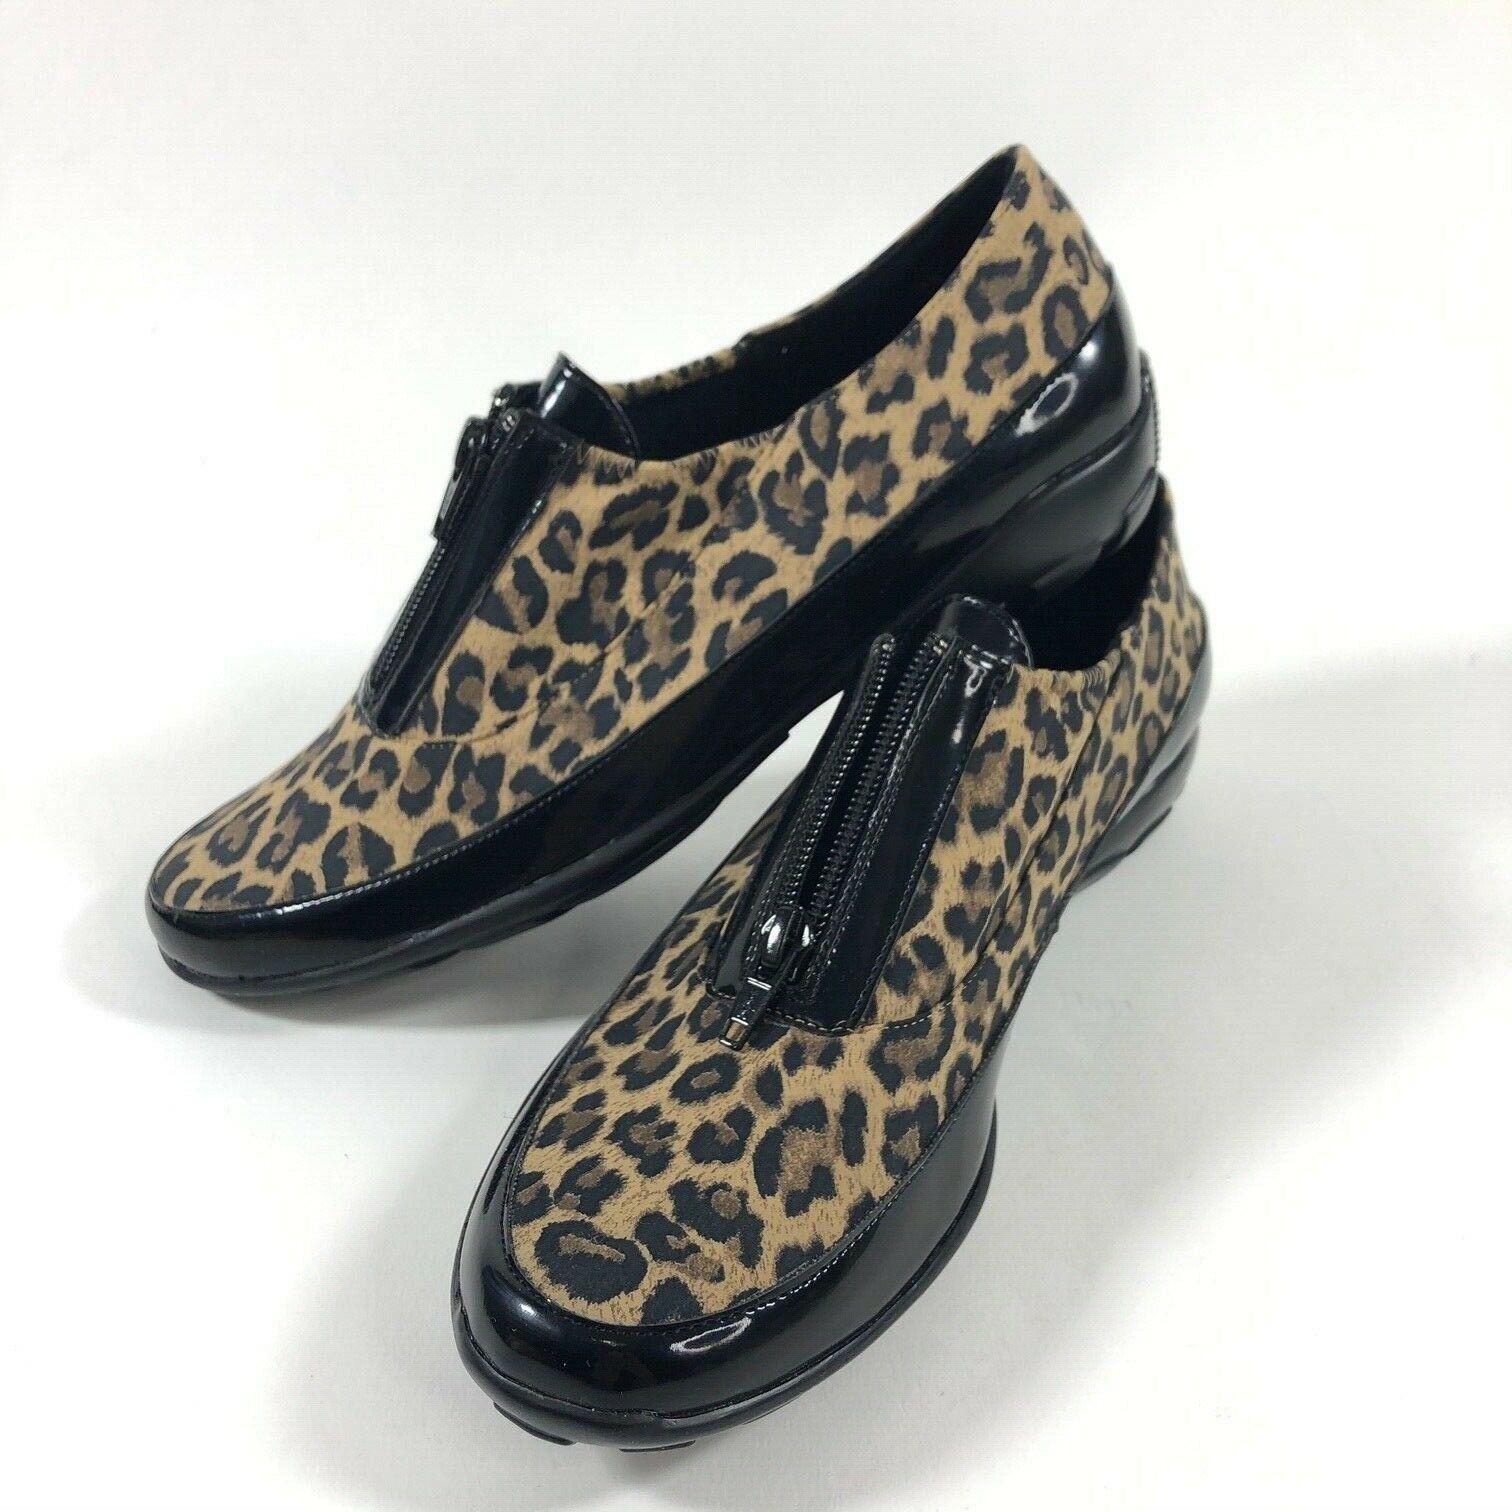 Vaneli Sport Donne Ariel Basic Textile Leopard Stampa Flats donna s 8N nero